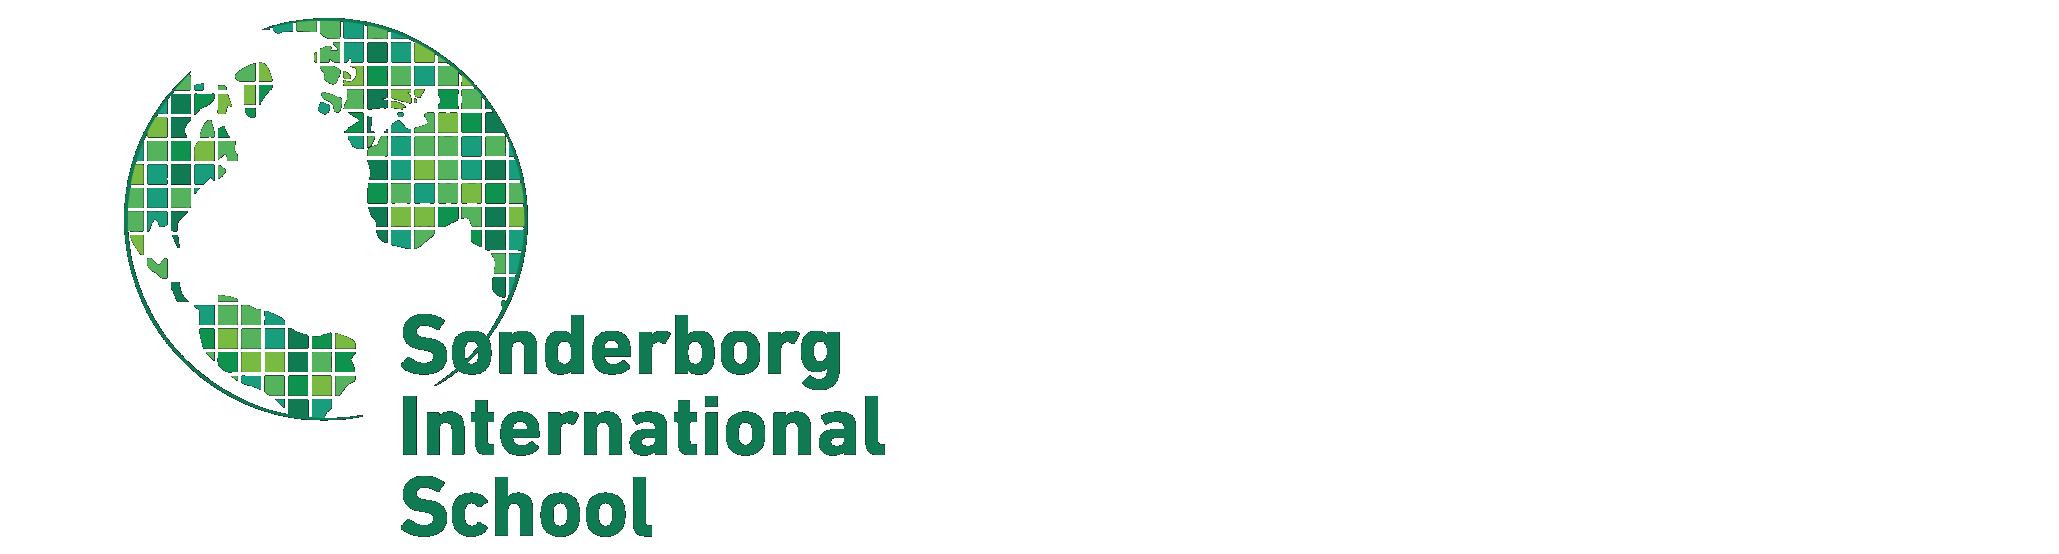 Sønderborg International School